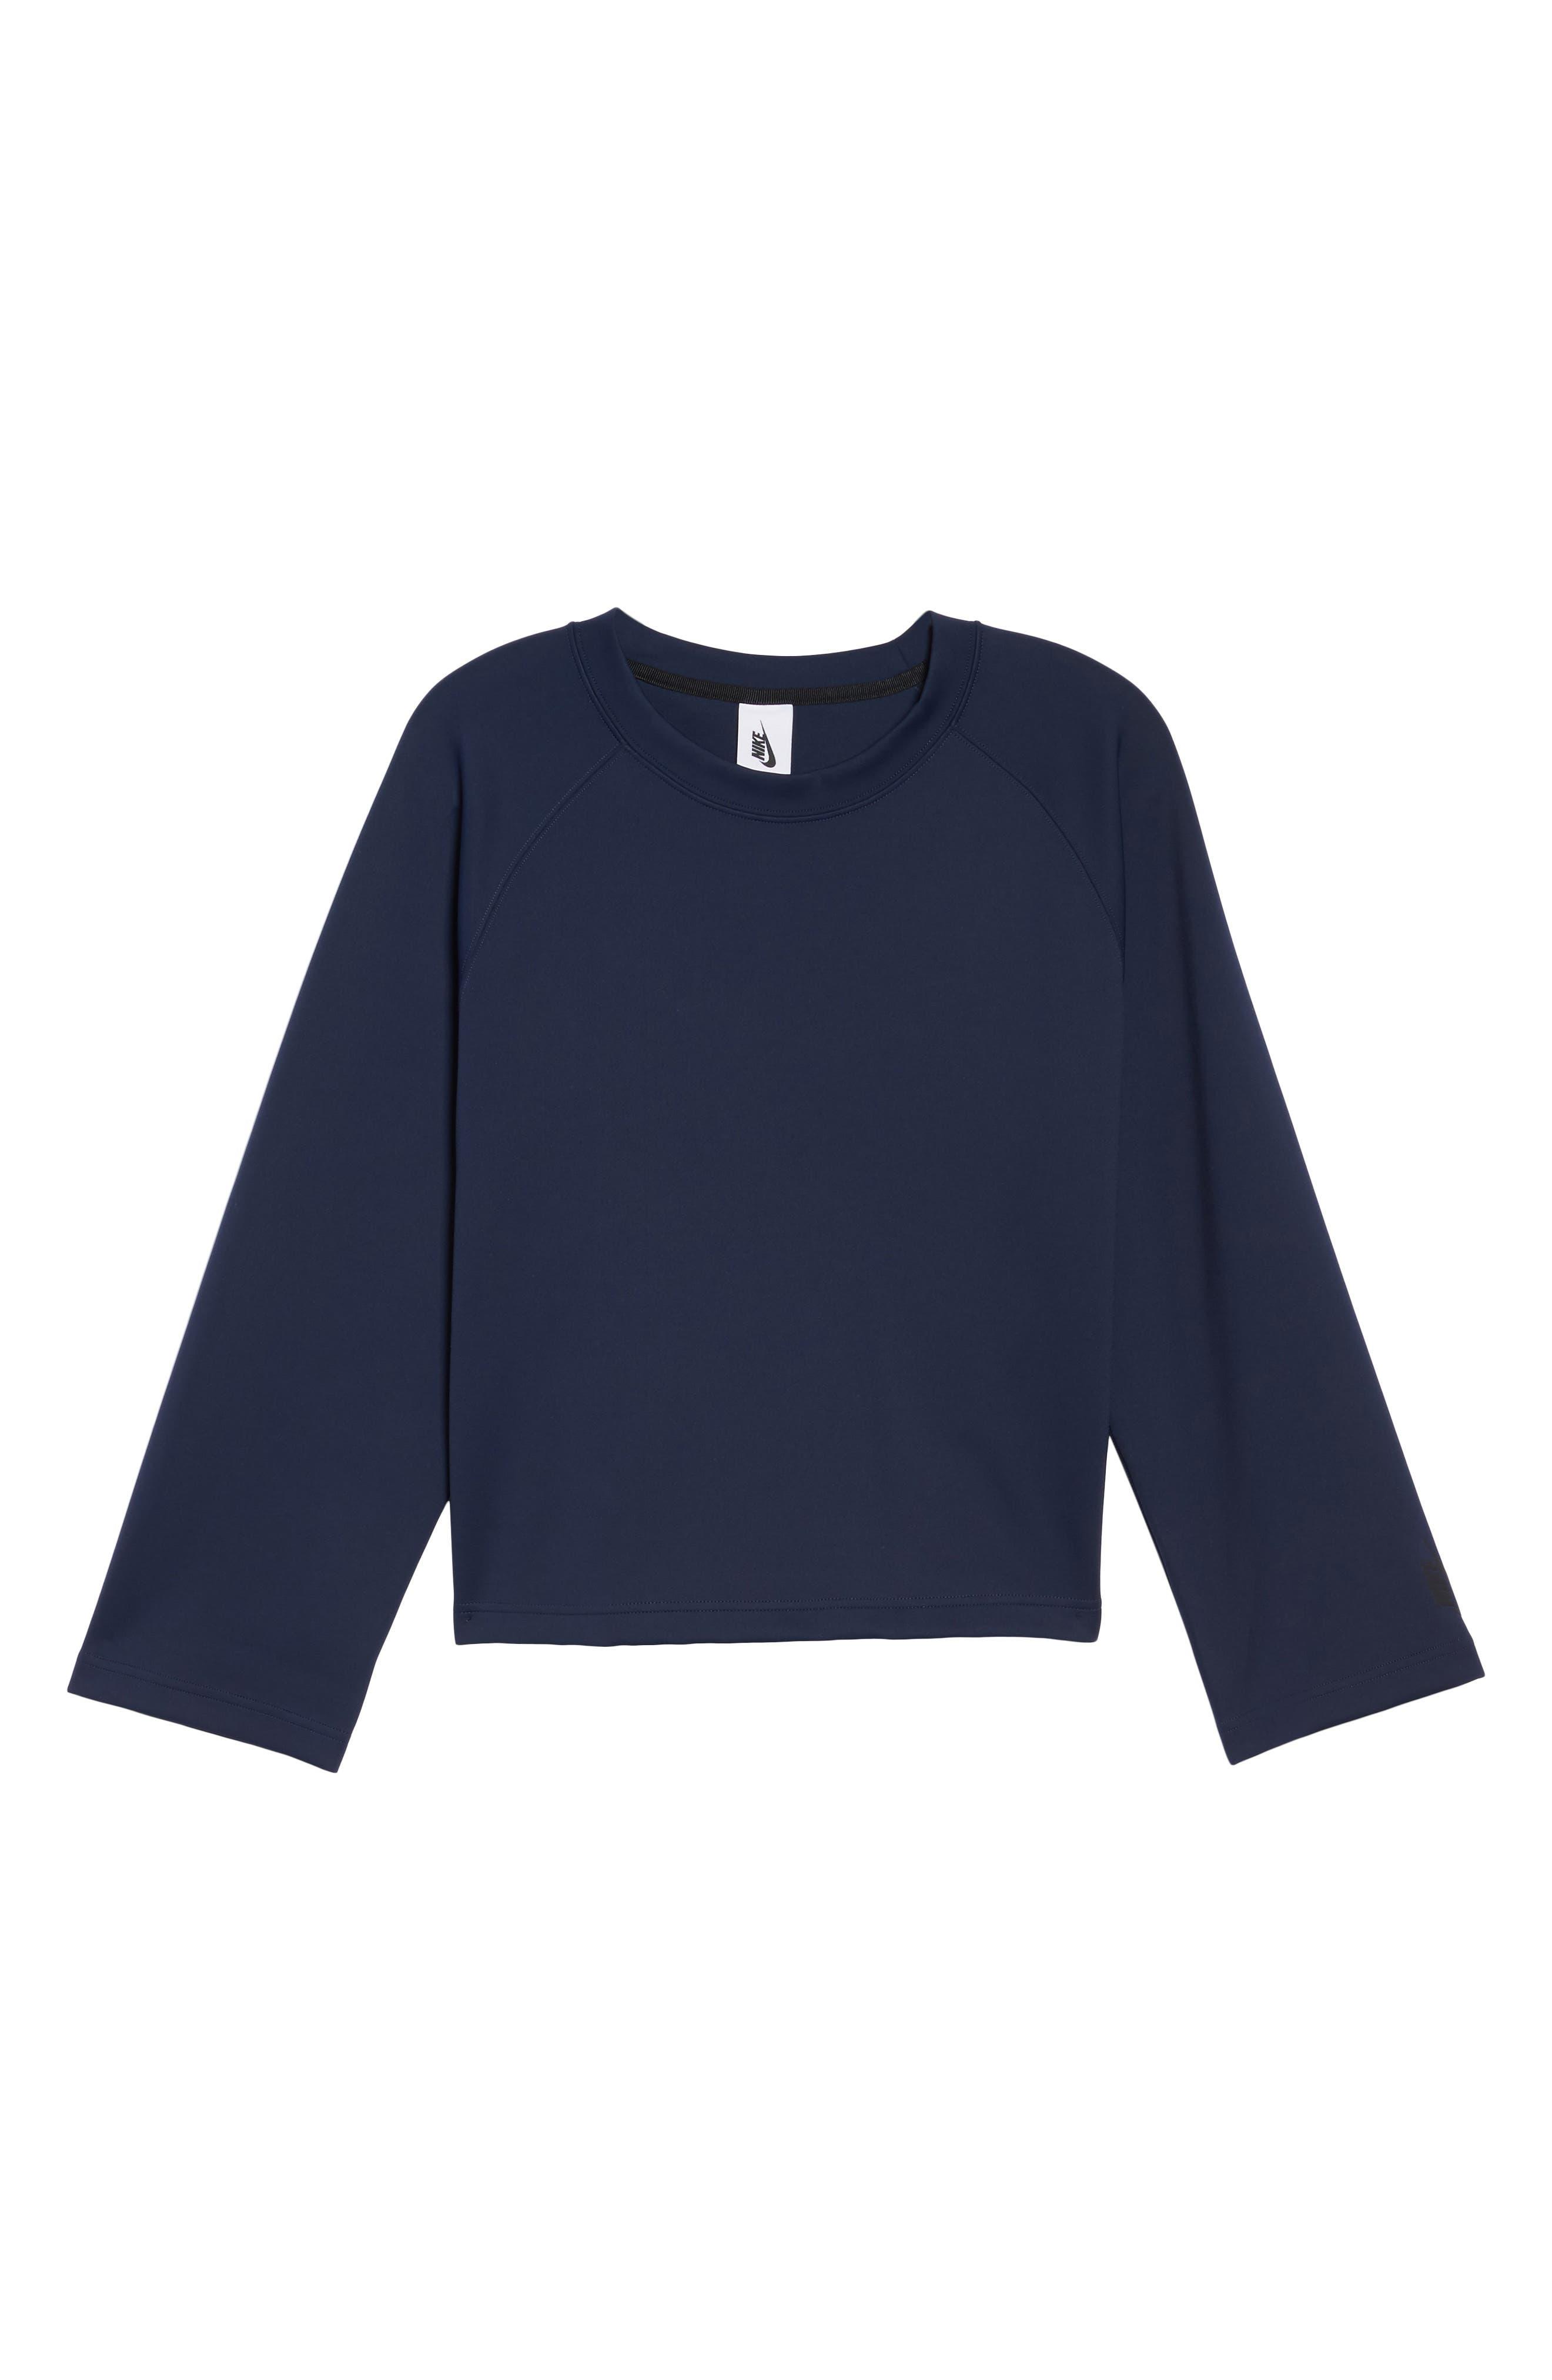 NikeLab Essentials Women's Fleece Top,                             Alternate thumbnail 13, color,